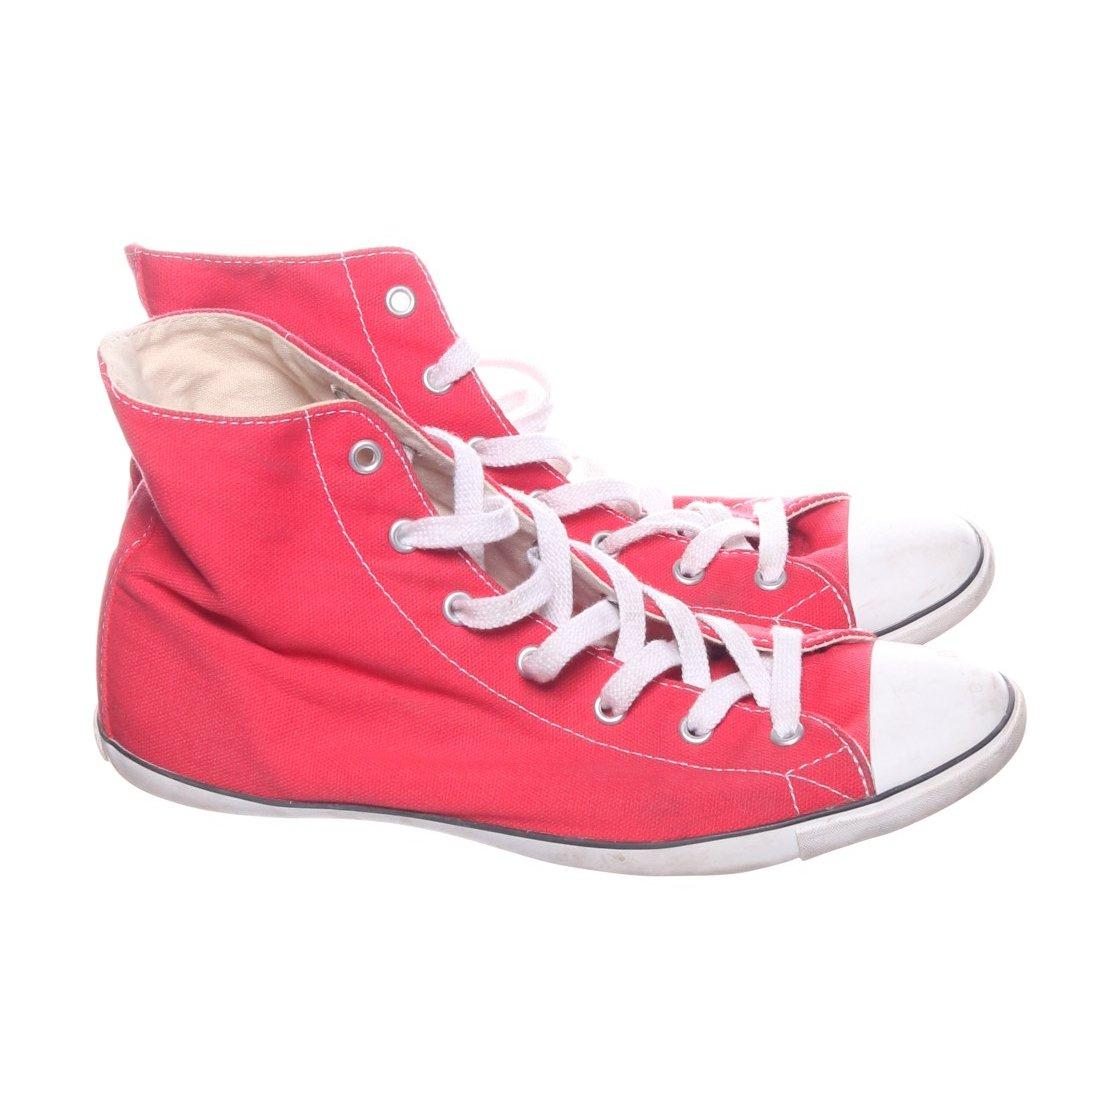 dfeeee88a65 Converse, Sneakers, Strl: 40, Röd/Vit (348432454) ᐈ Sellpy på Tradera